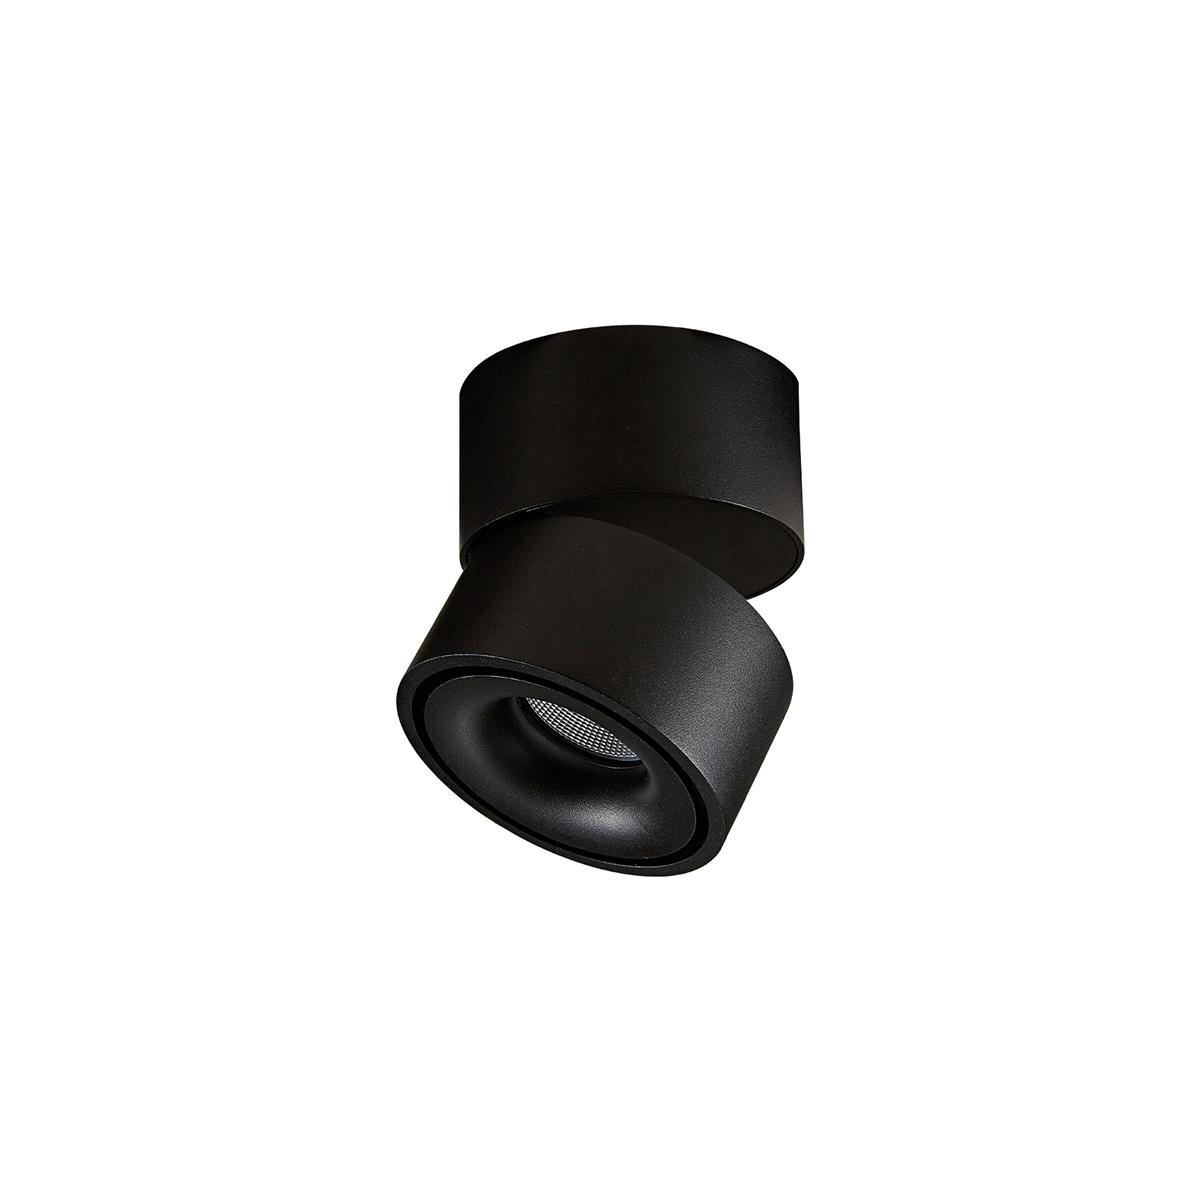 Look Mini 9.2W LED 34dgr 2700K 845lm CRI>90 Dimm Black-1